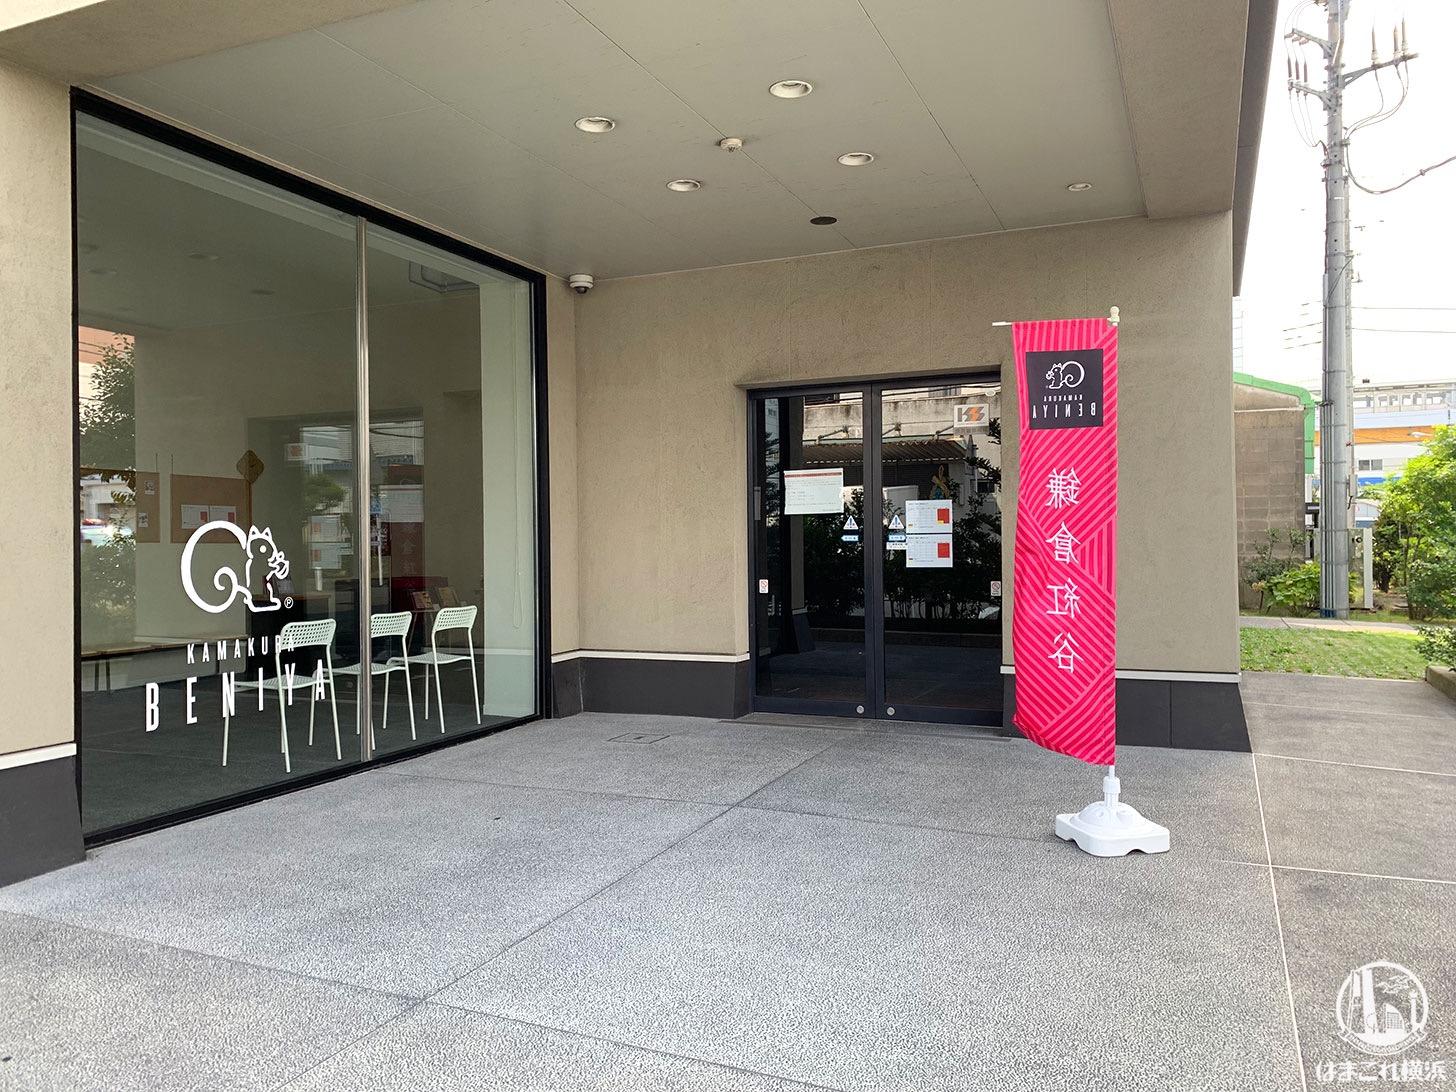 鎌倉紅谷 幸浦店